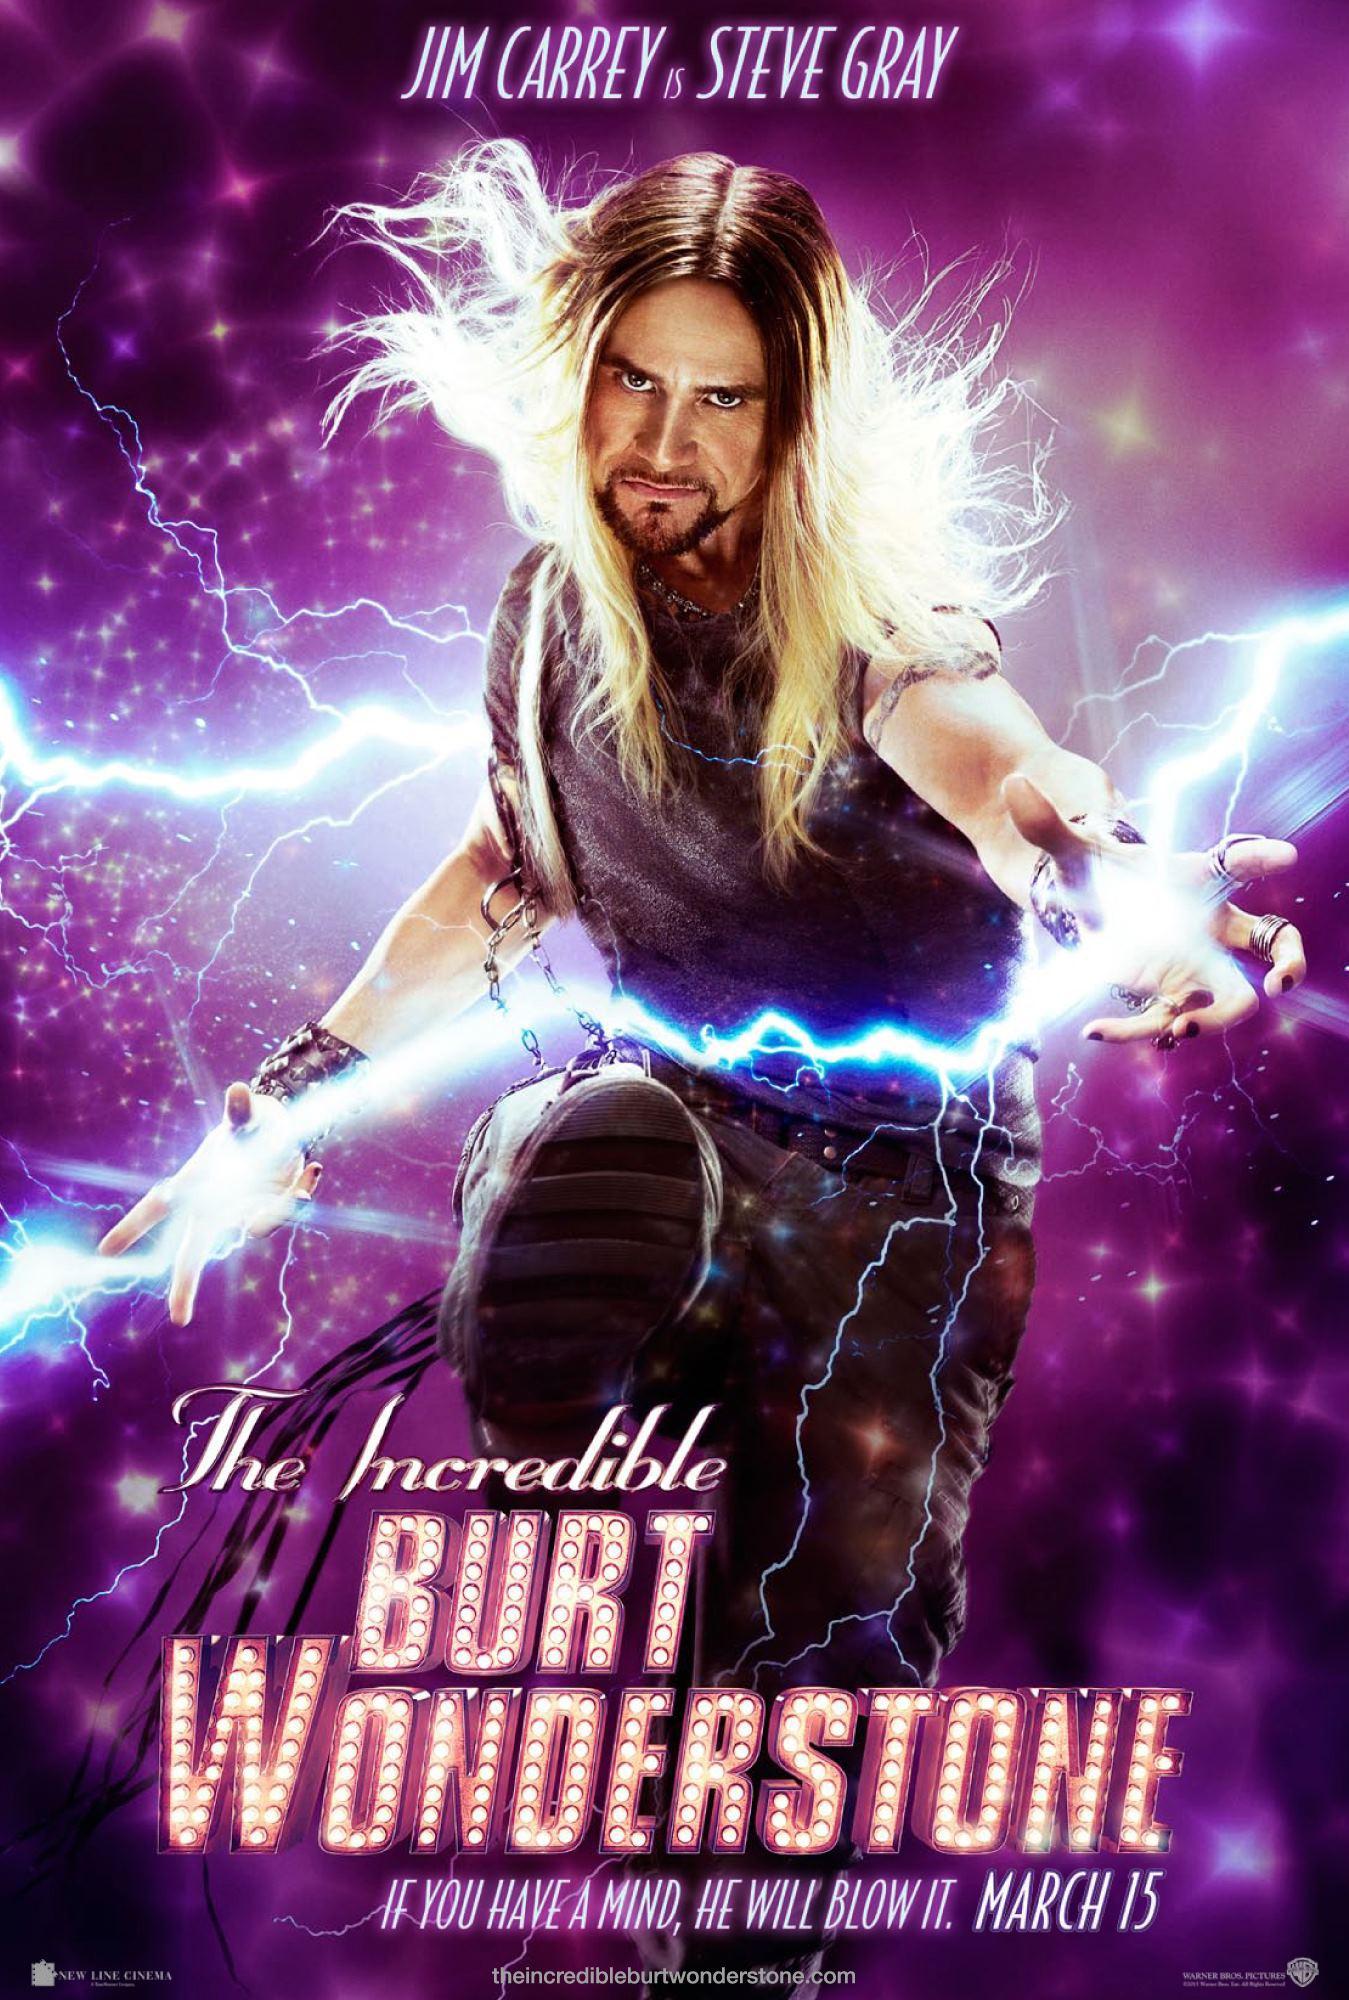 The Incredible Burt Wonderstone - Movie Poster #4 (Original)